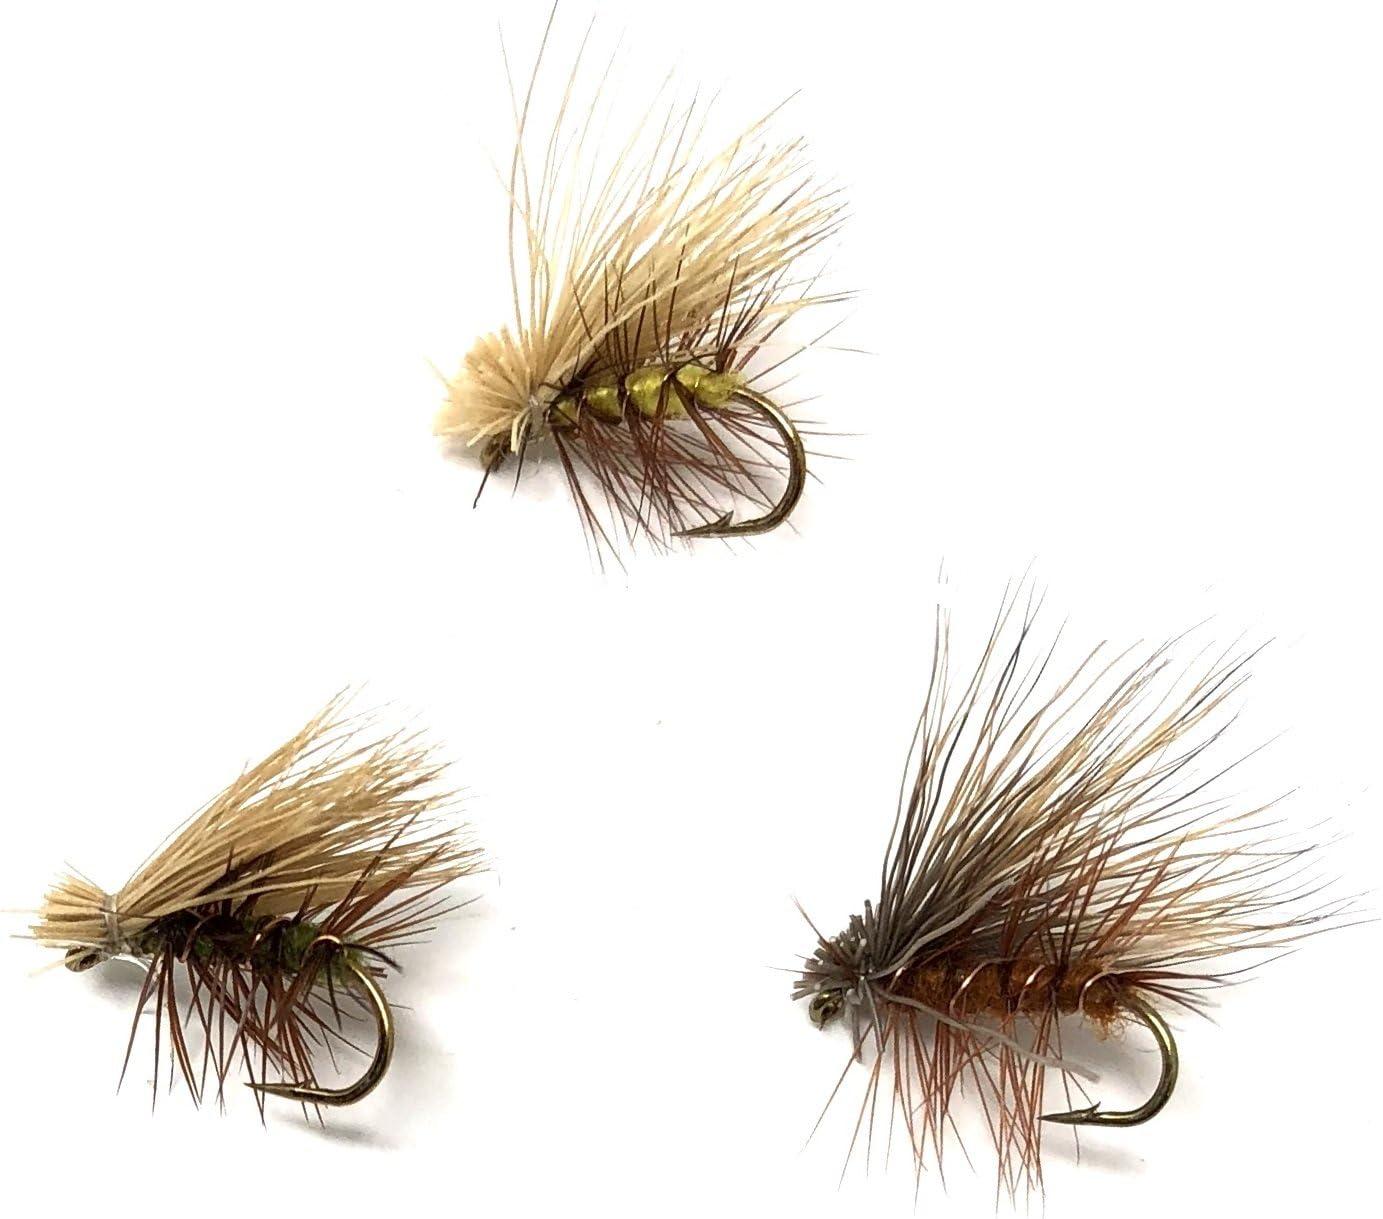 Feeder Creek Elk Rapid rise El Paso Mall Hair Caddis Fly Attract Assortment Fishing